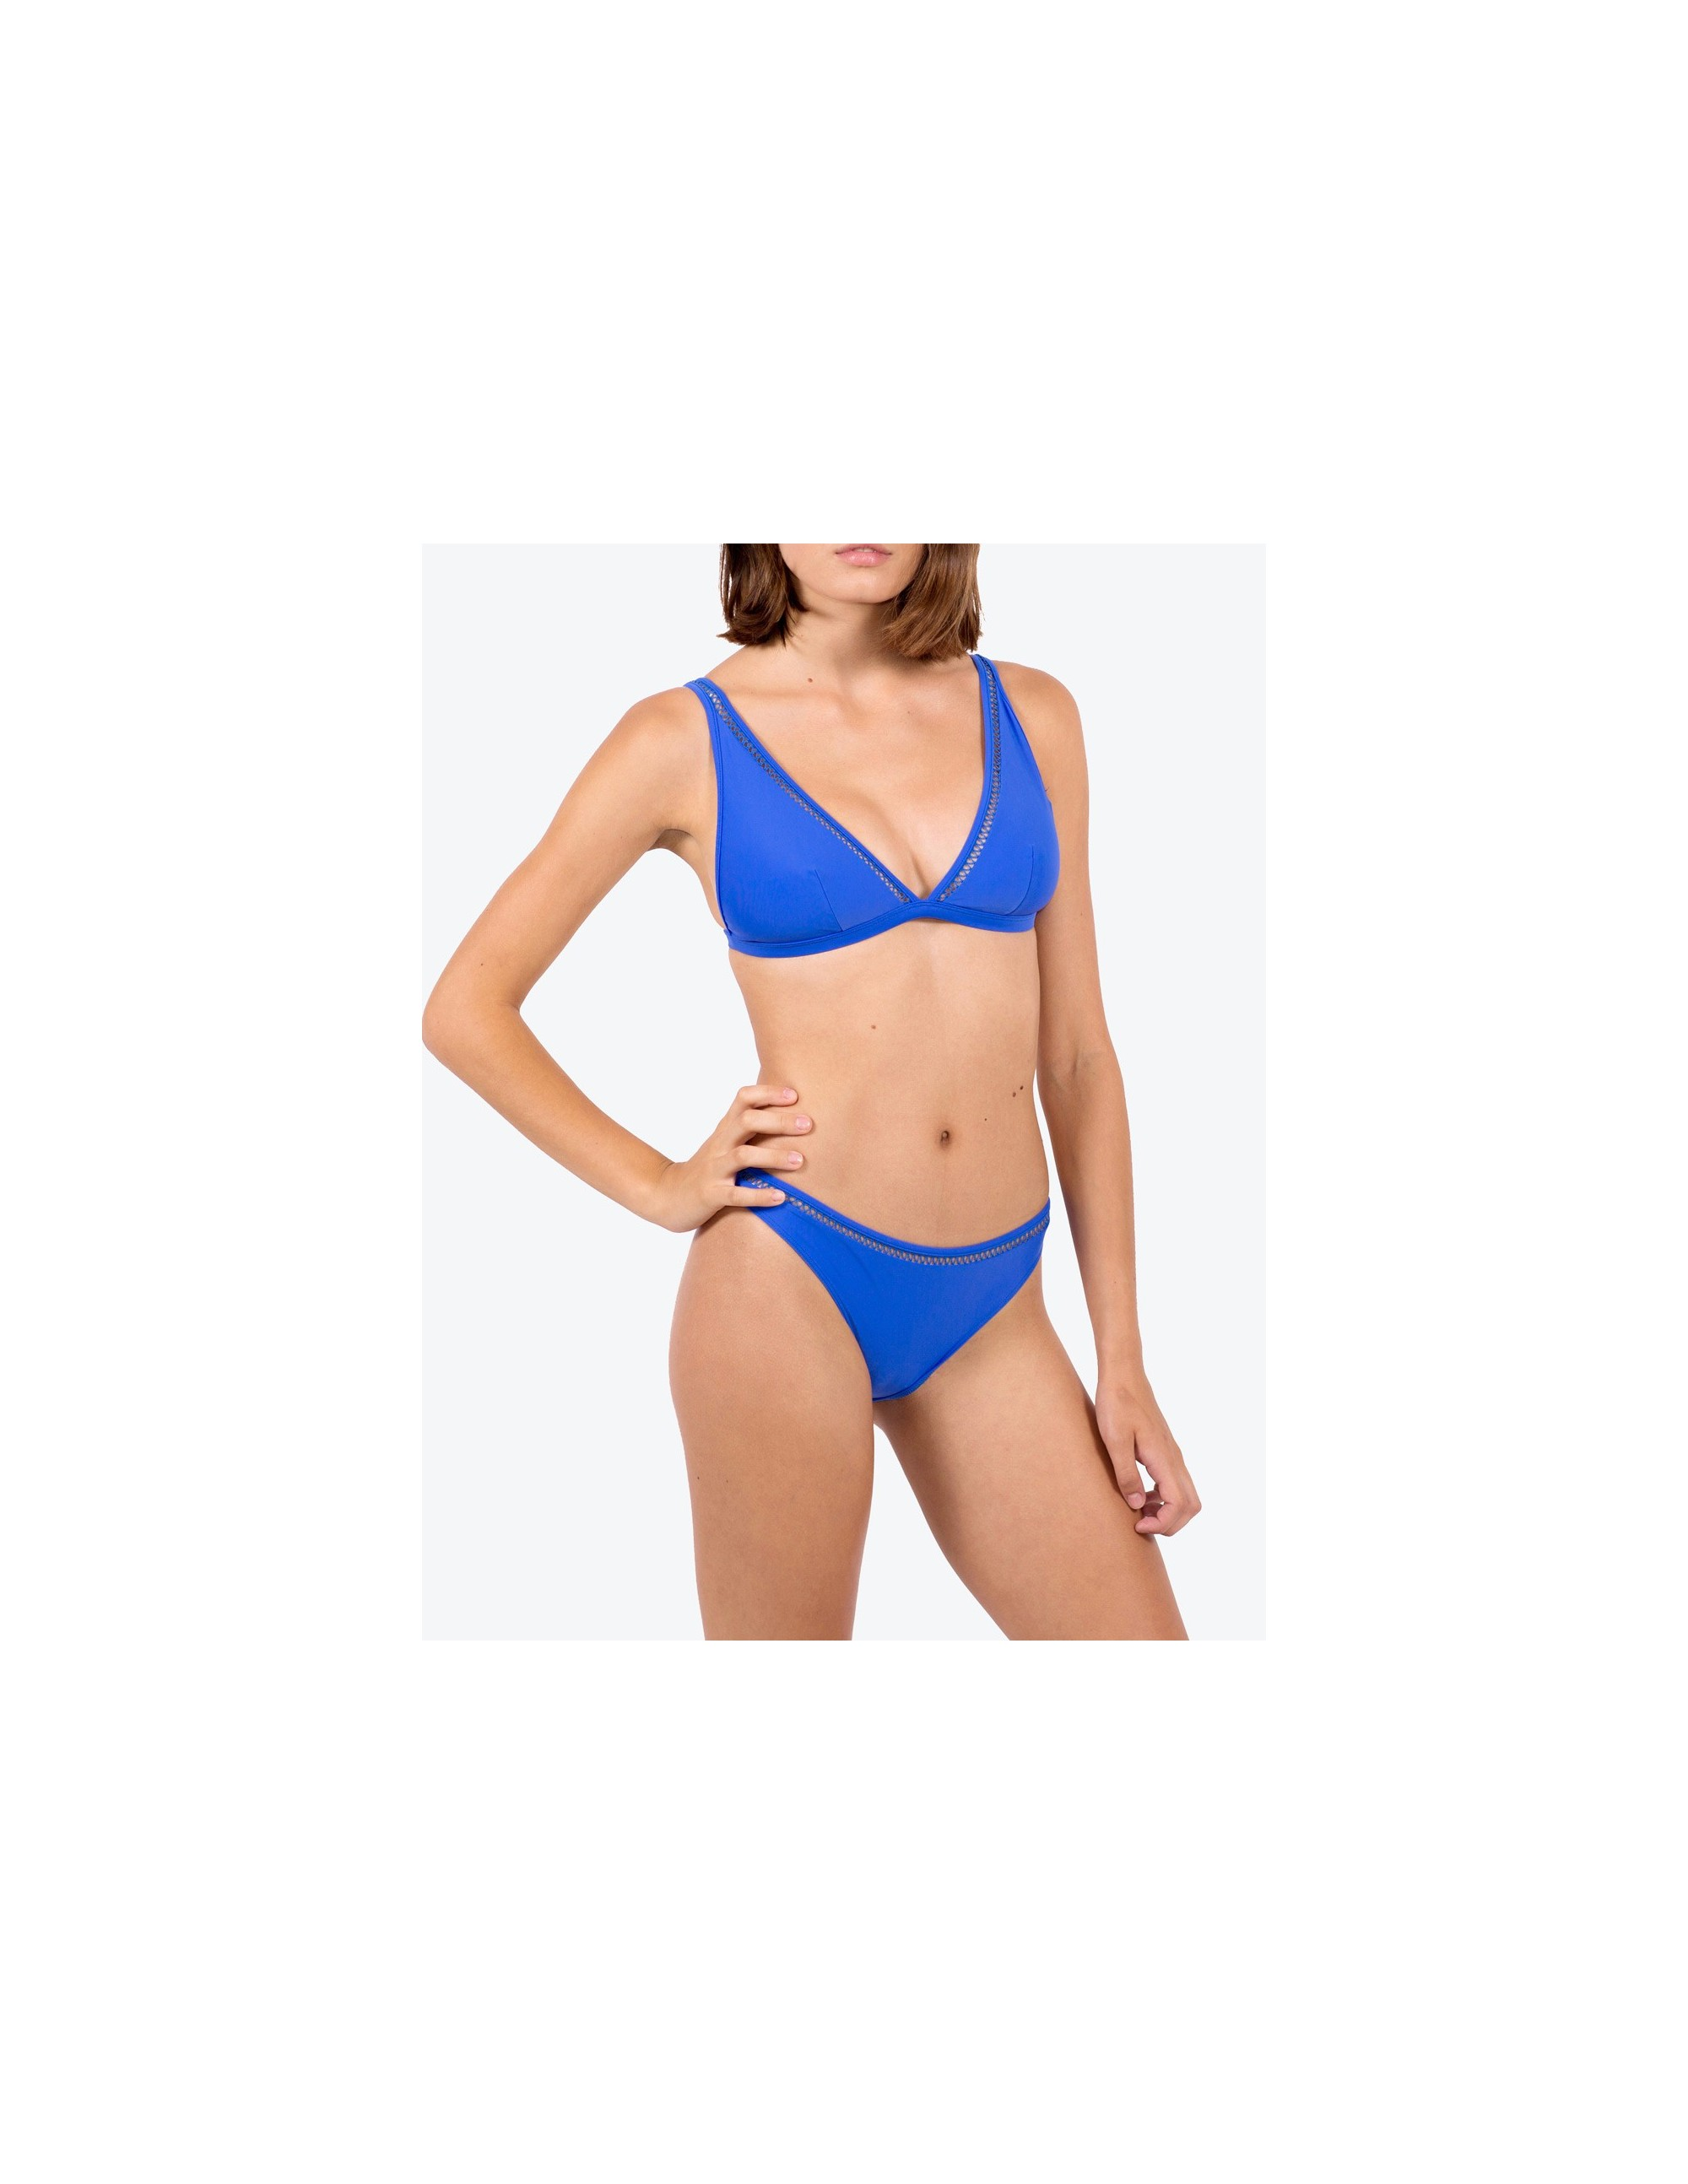 BELLA bikini top - ECHO BLUE